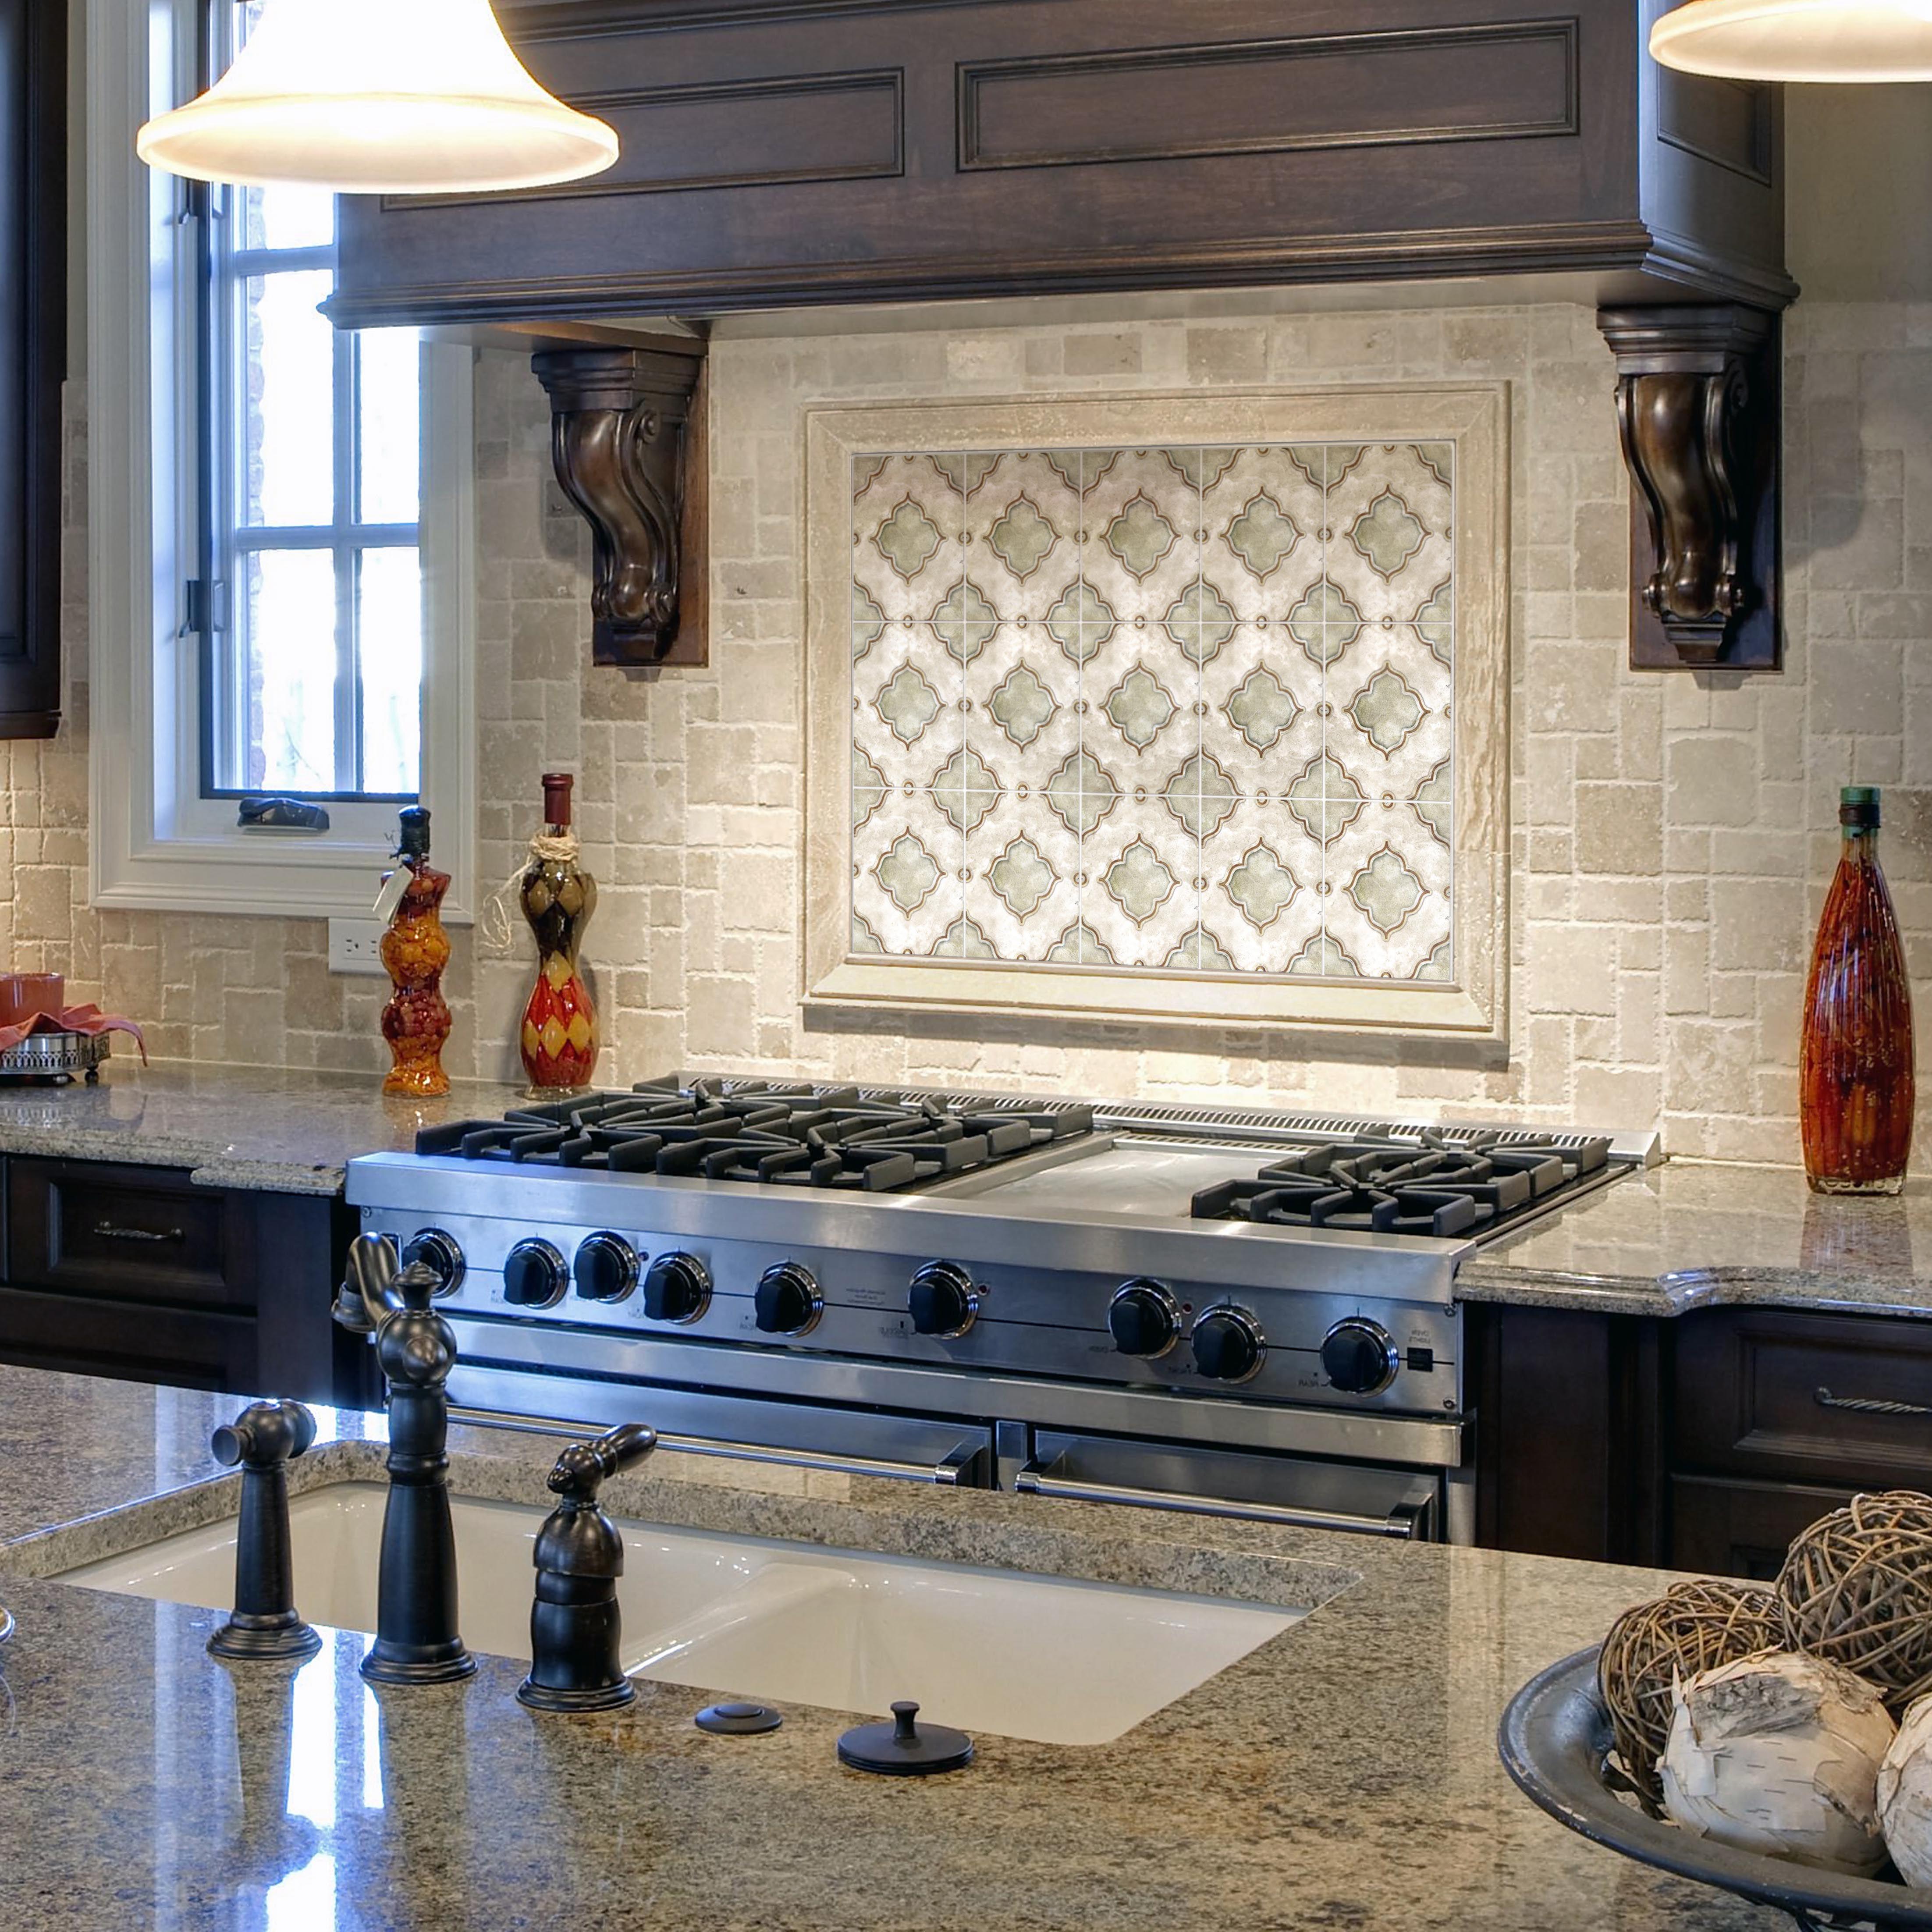 The Kensington Pattern From The Artisan Stone Tile Durango Enchanting Kitchen Backsplash Designs Pictures Design Ideas